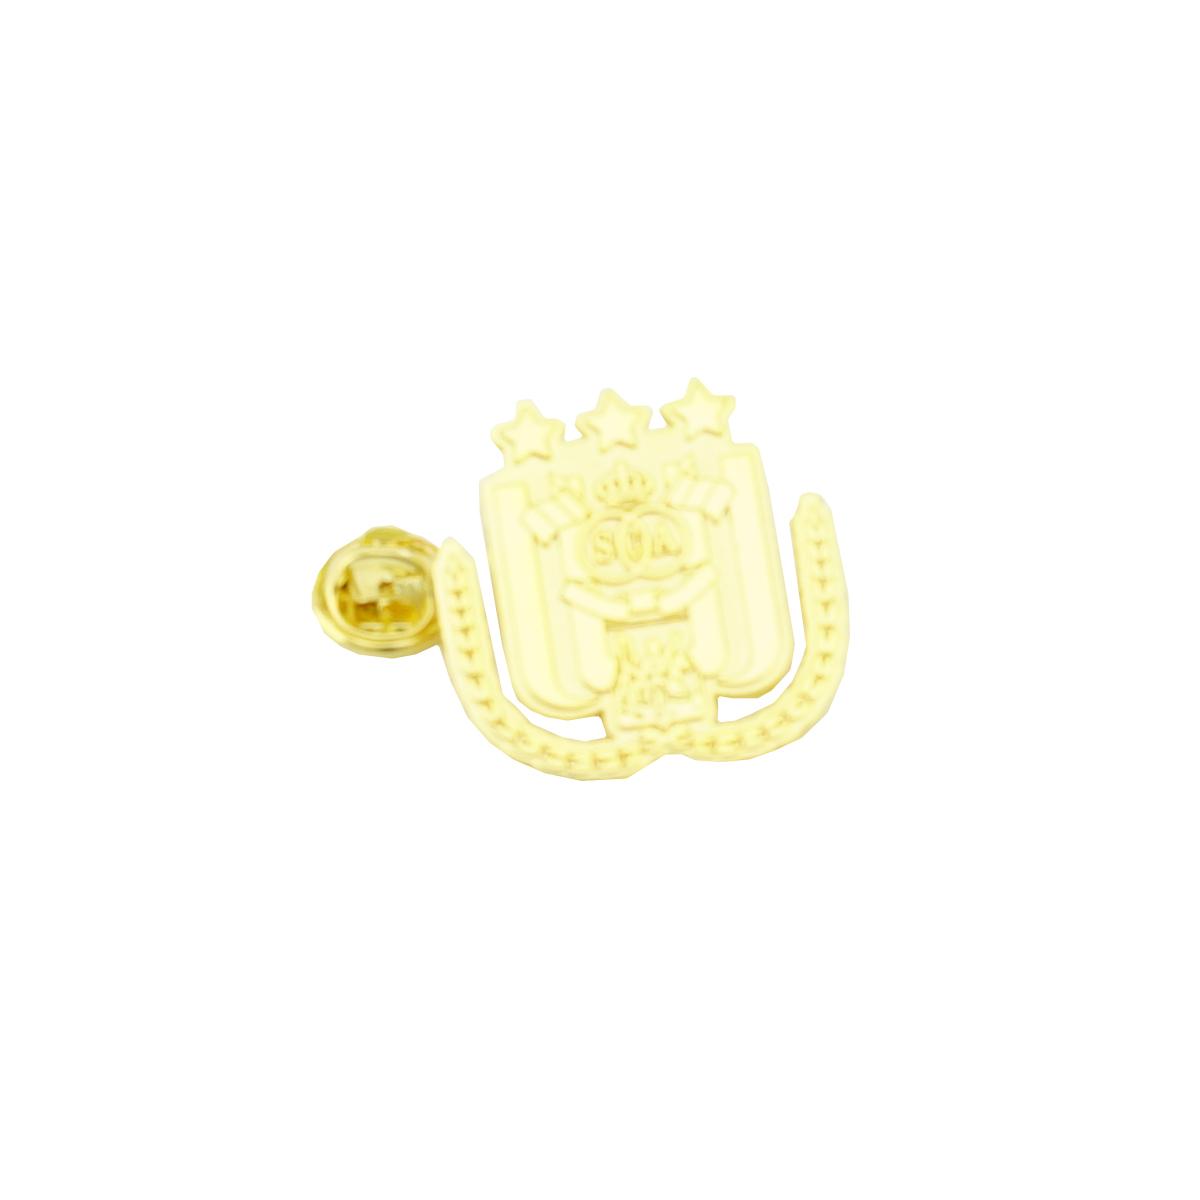 Pin logo RSCA - Gold